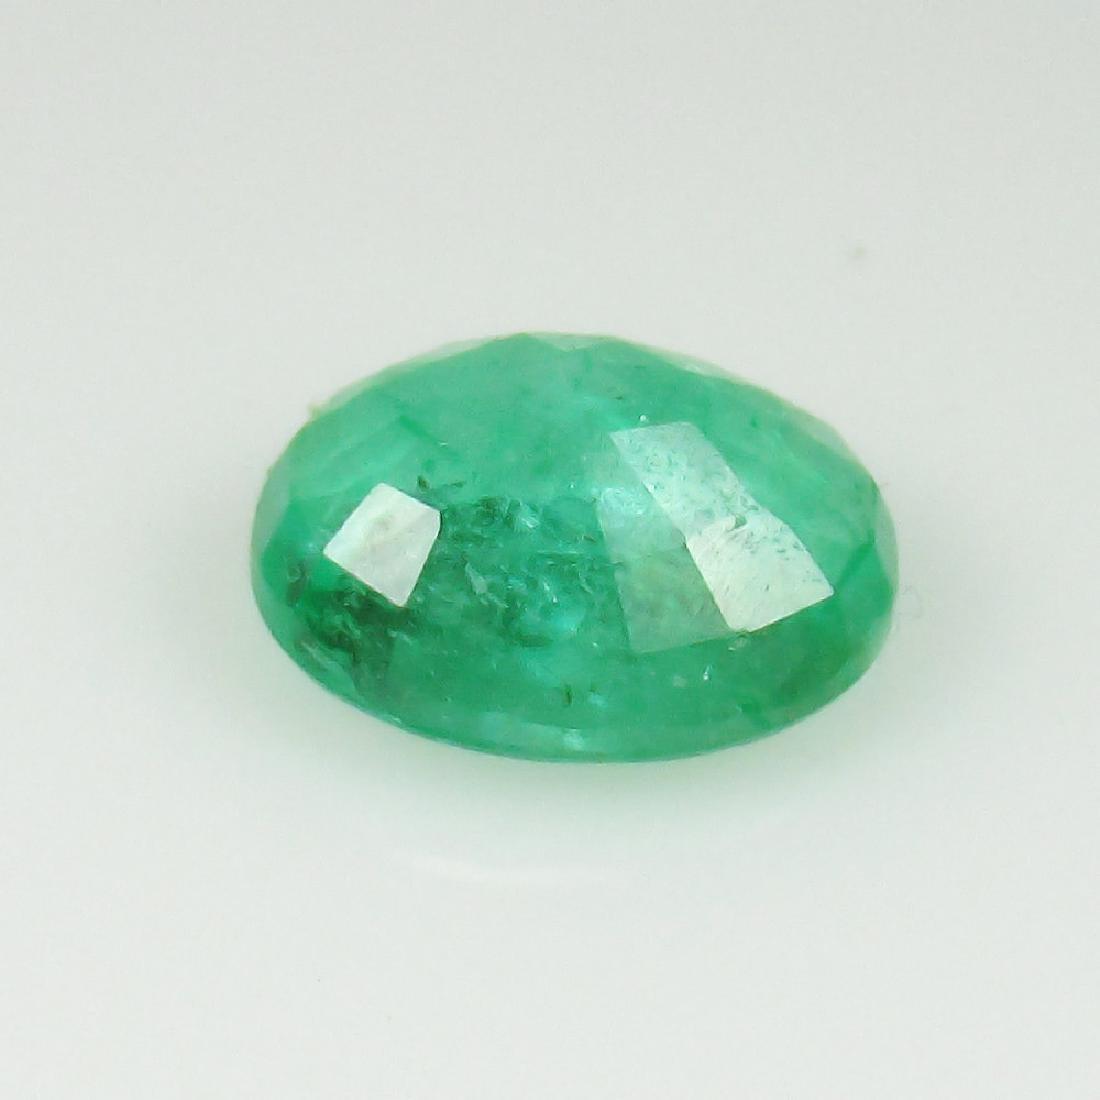 1.35 Ctw Natural Zambian Loose Oval cut Emerald - 4